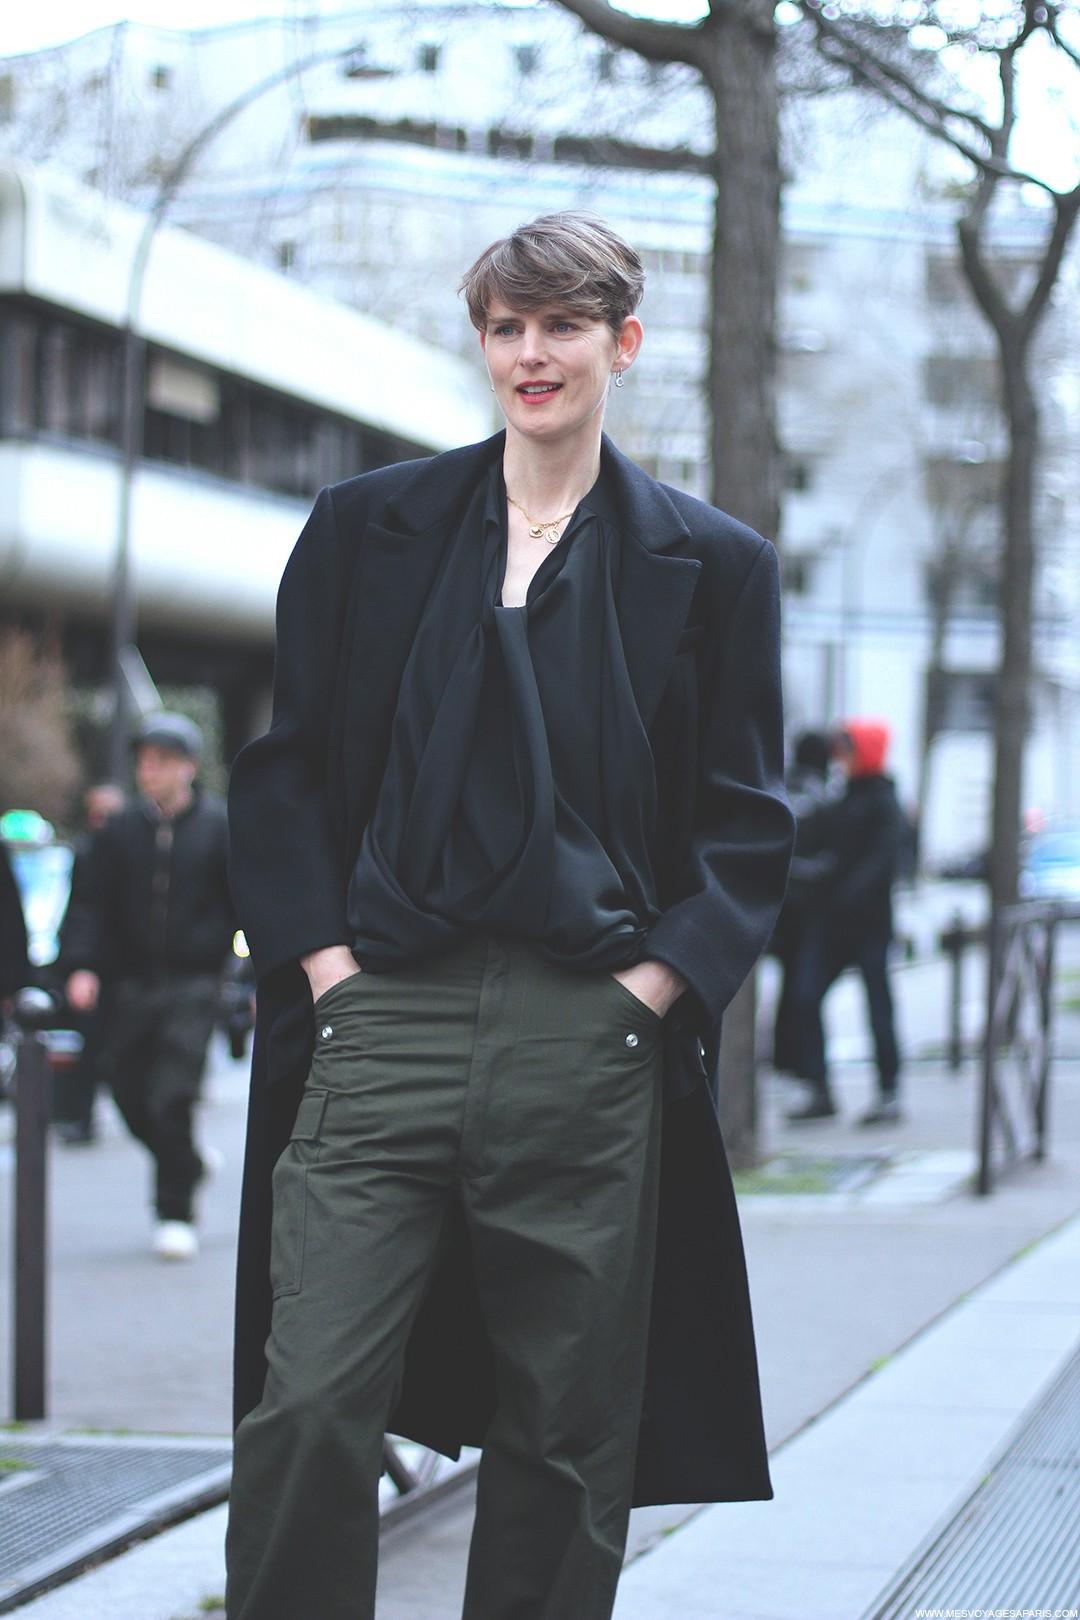 mes-voyages-a-paris-fashion-week-street-style-blog copia 2